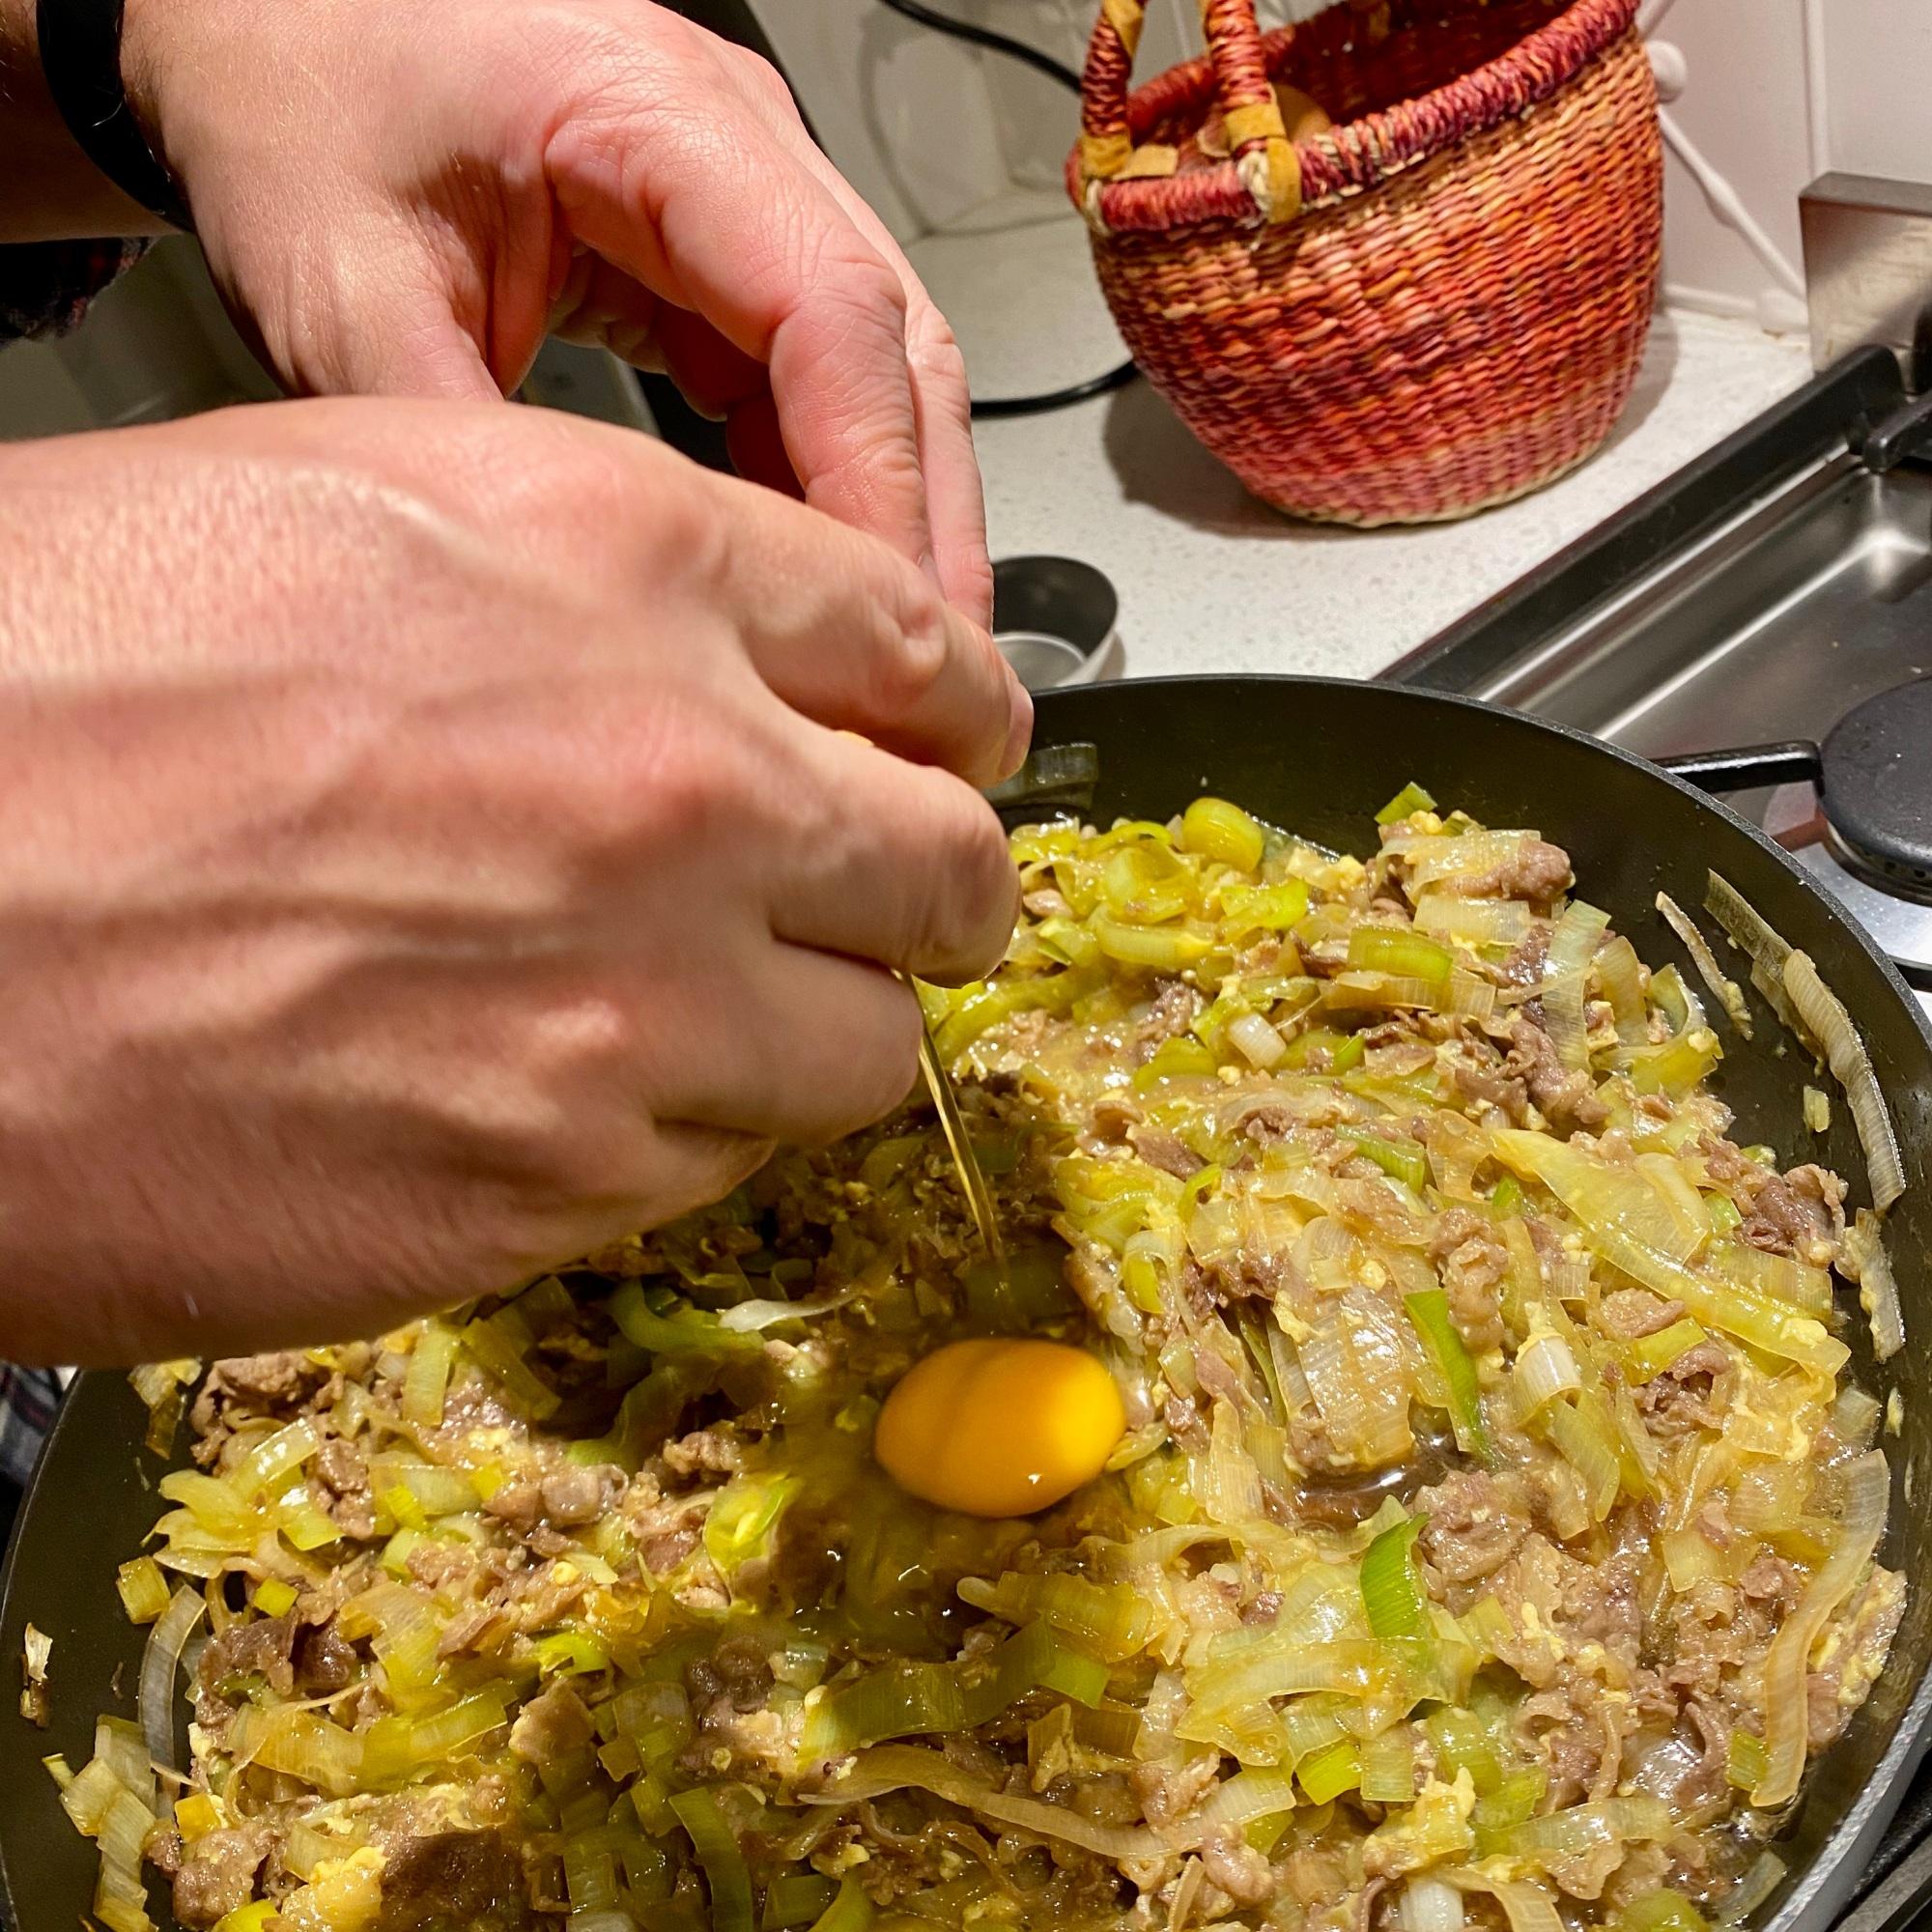 Cracking an egg into the sukiyaki